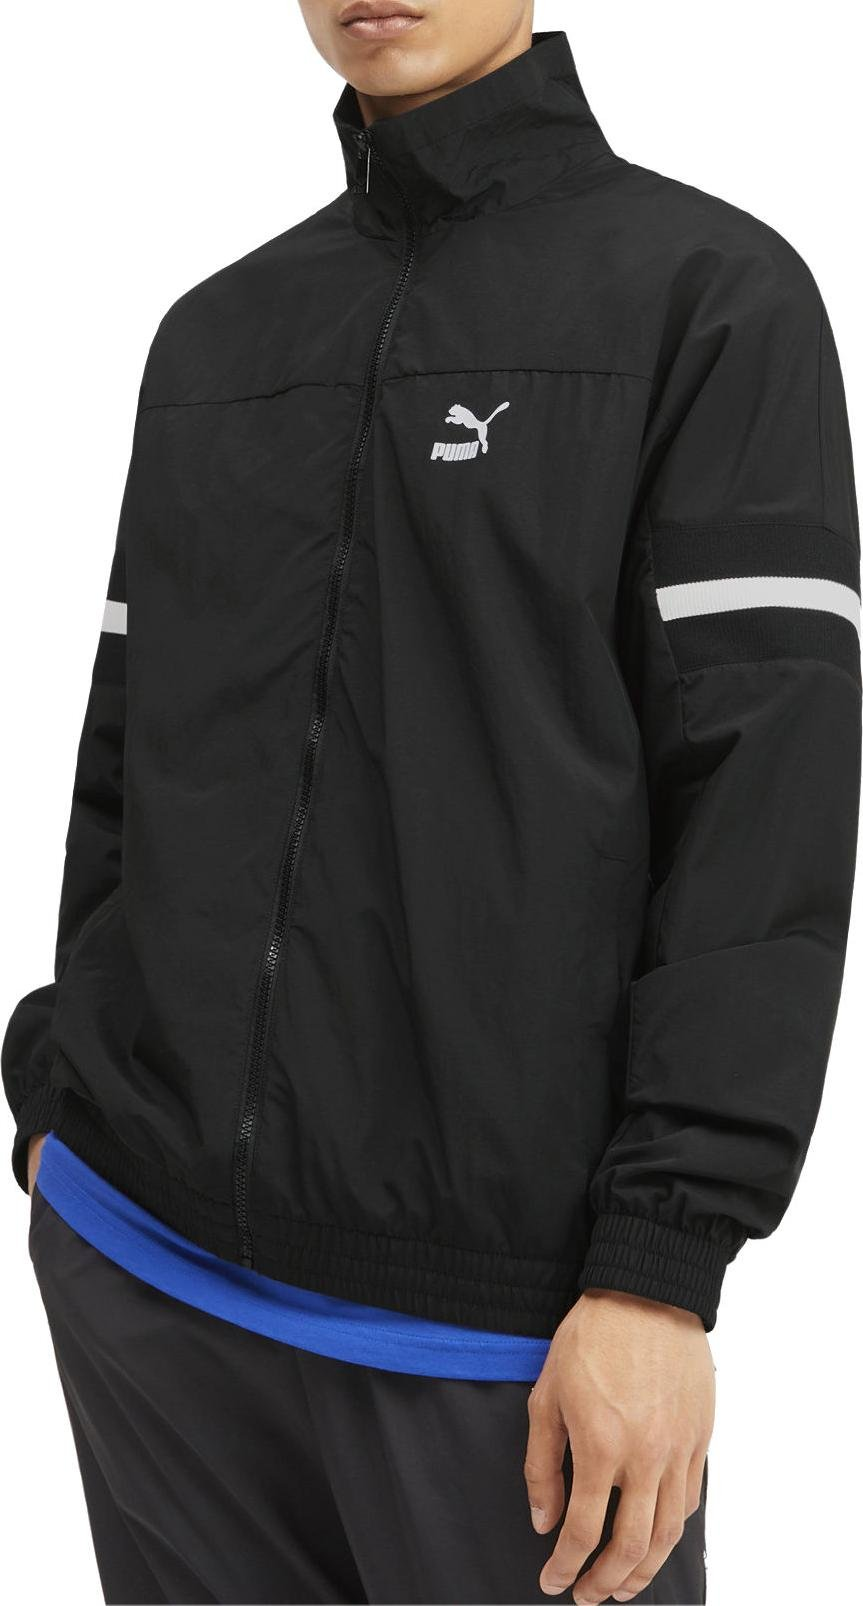 Bunda Puma XTG Woven Jacket